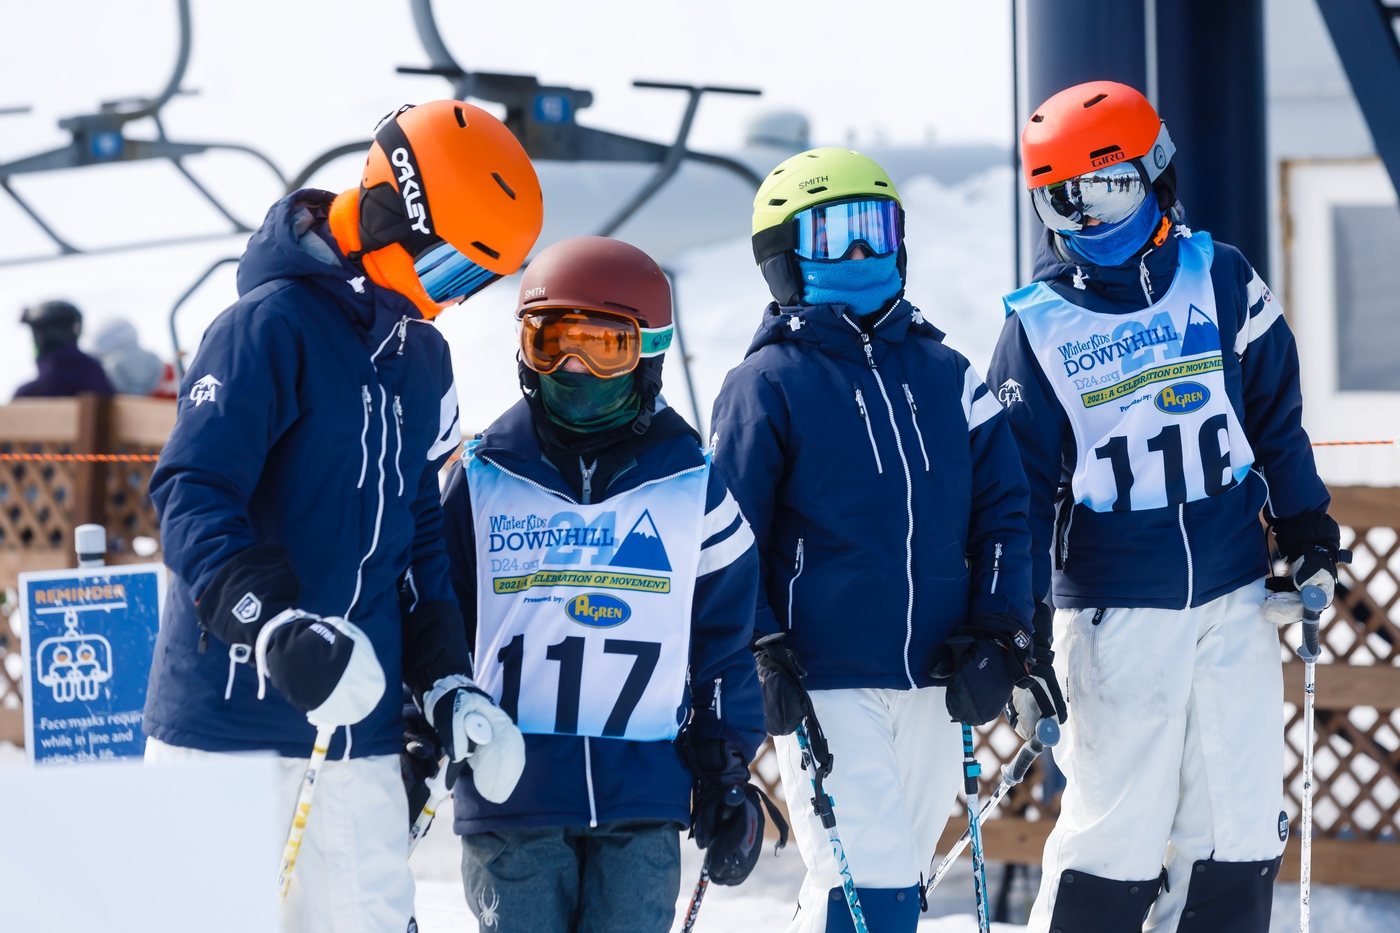 WinterKids Downhill 24 2021 SDP 3252